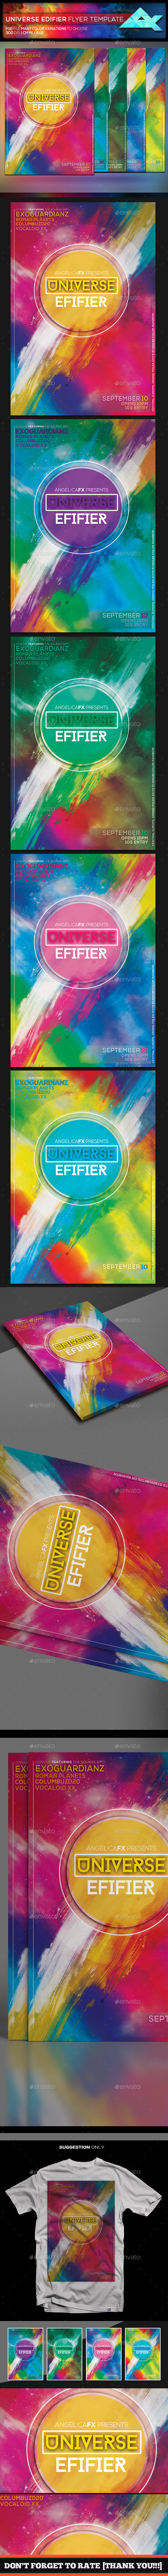 Universe Edifier Flyer Template - Flyers Print Templates